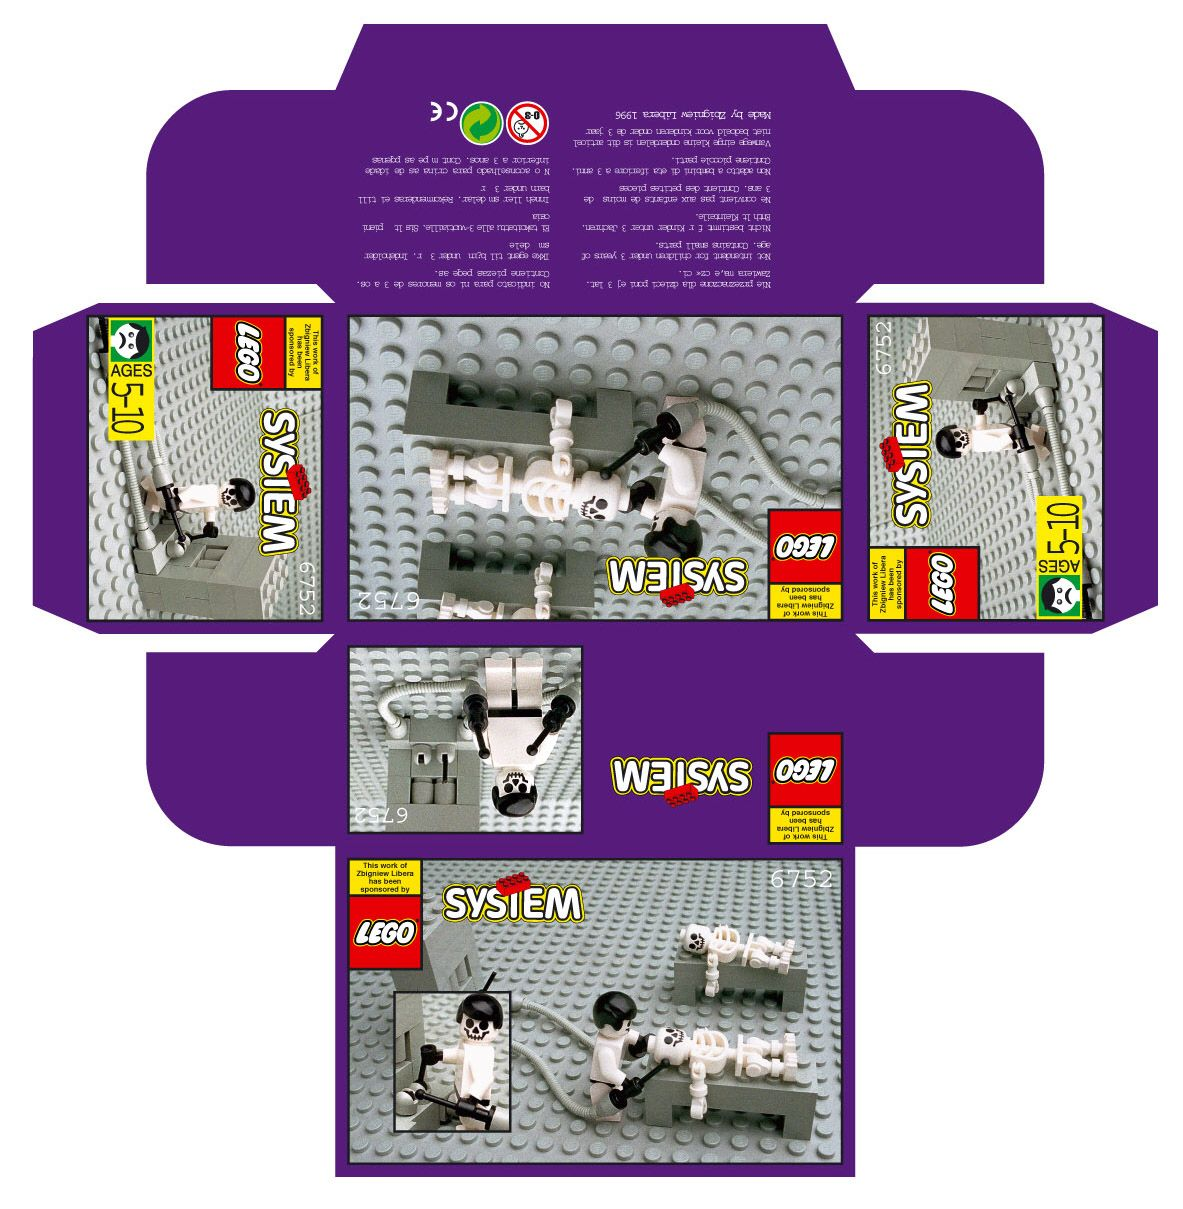 Image From Rastert Galeria Artysci Libera Lego Xl Libera Lego Wykroj 01 20